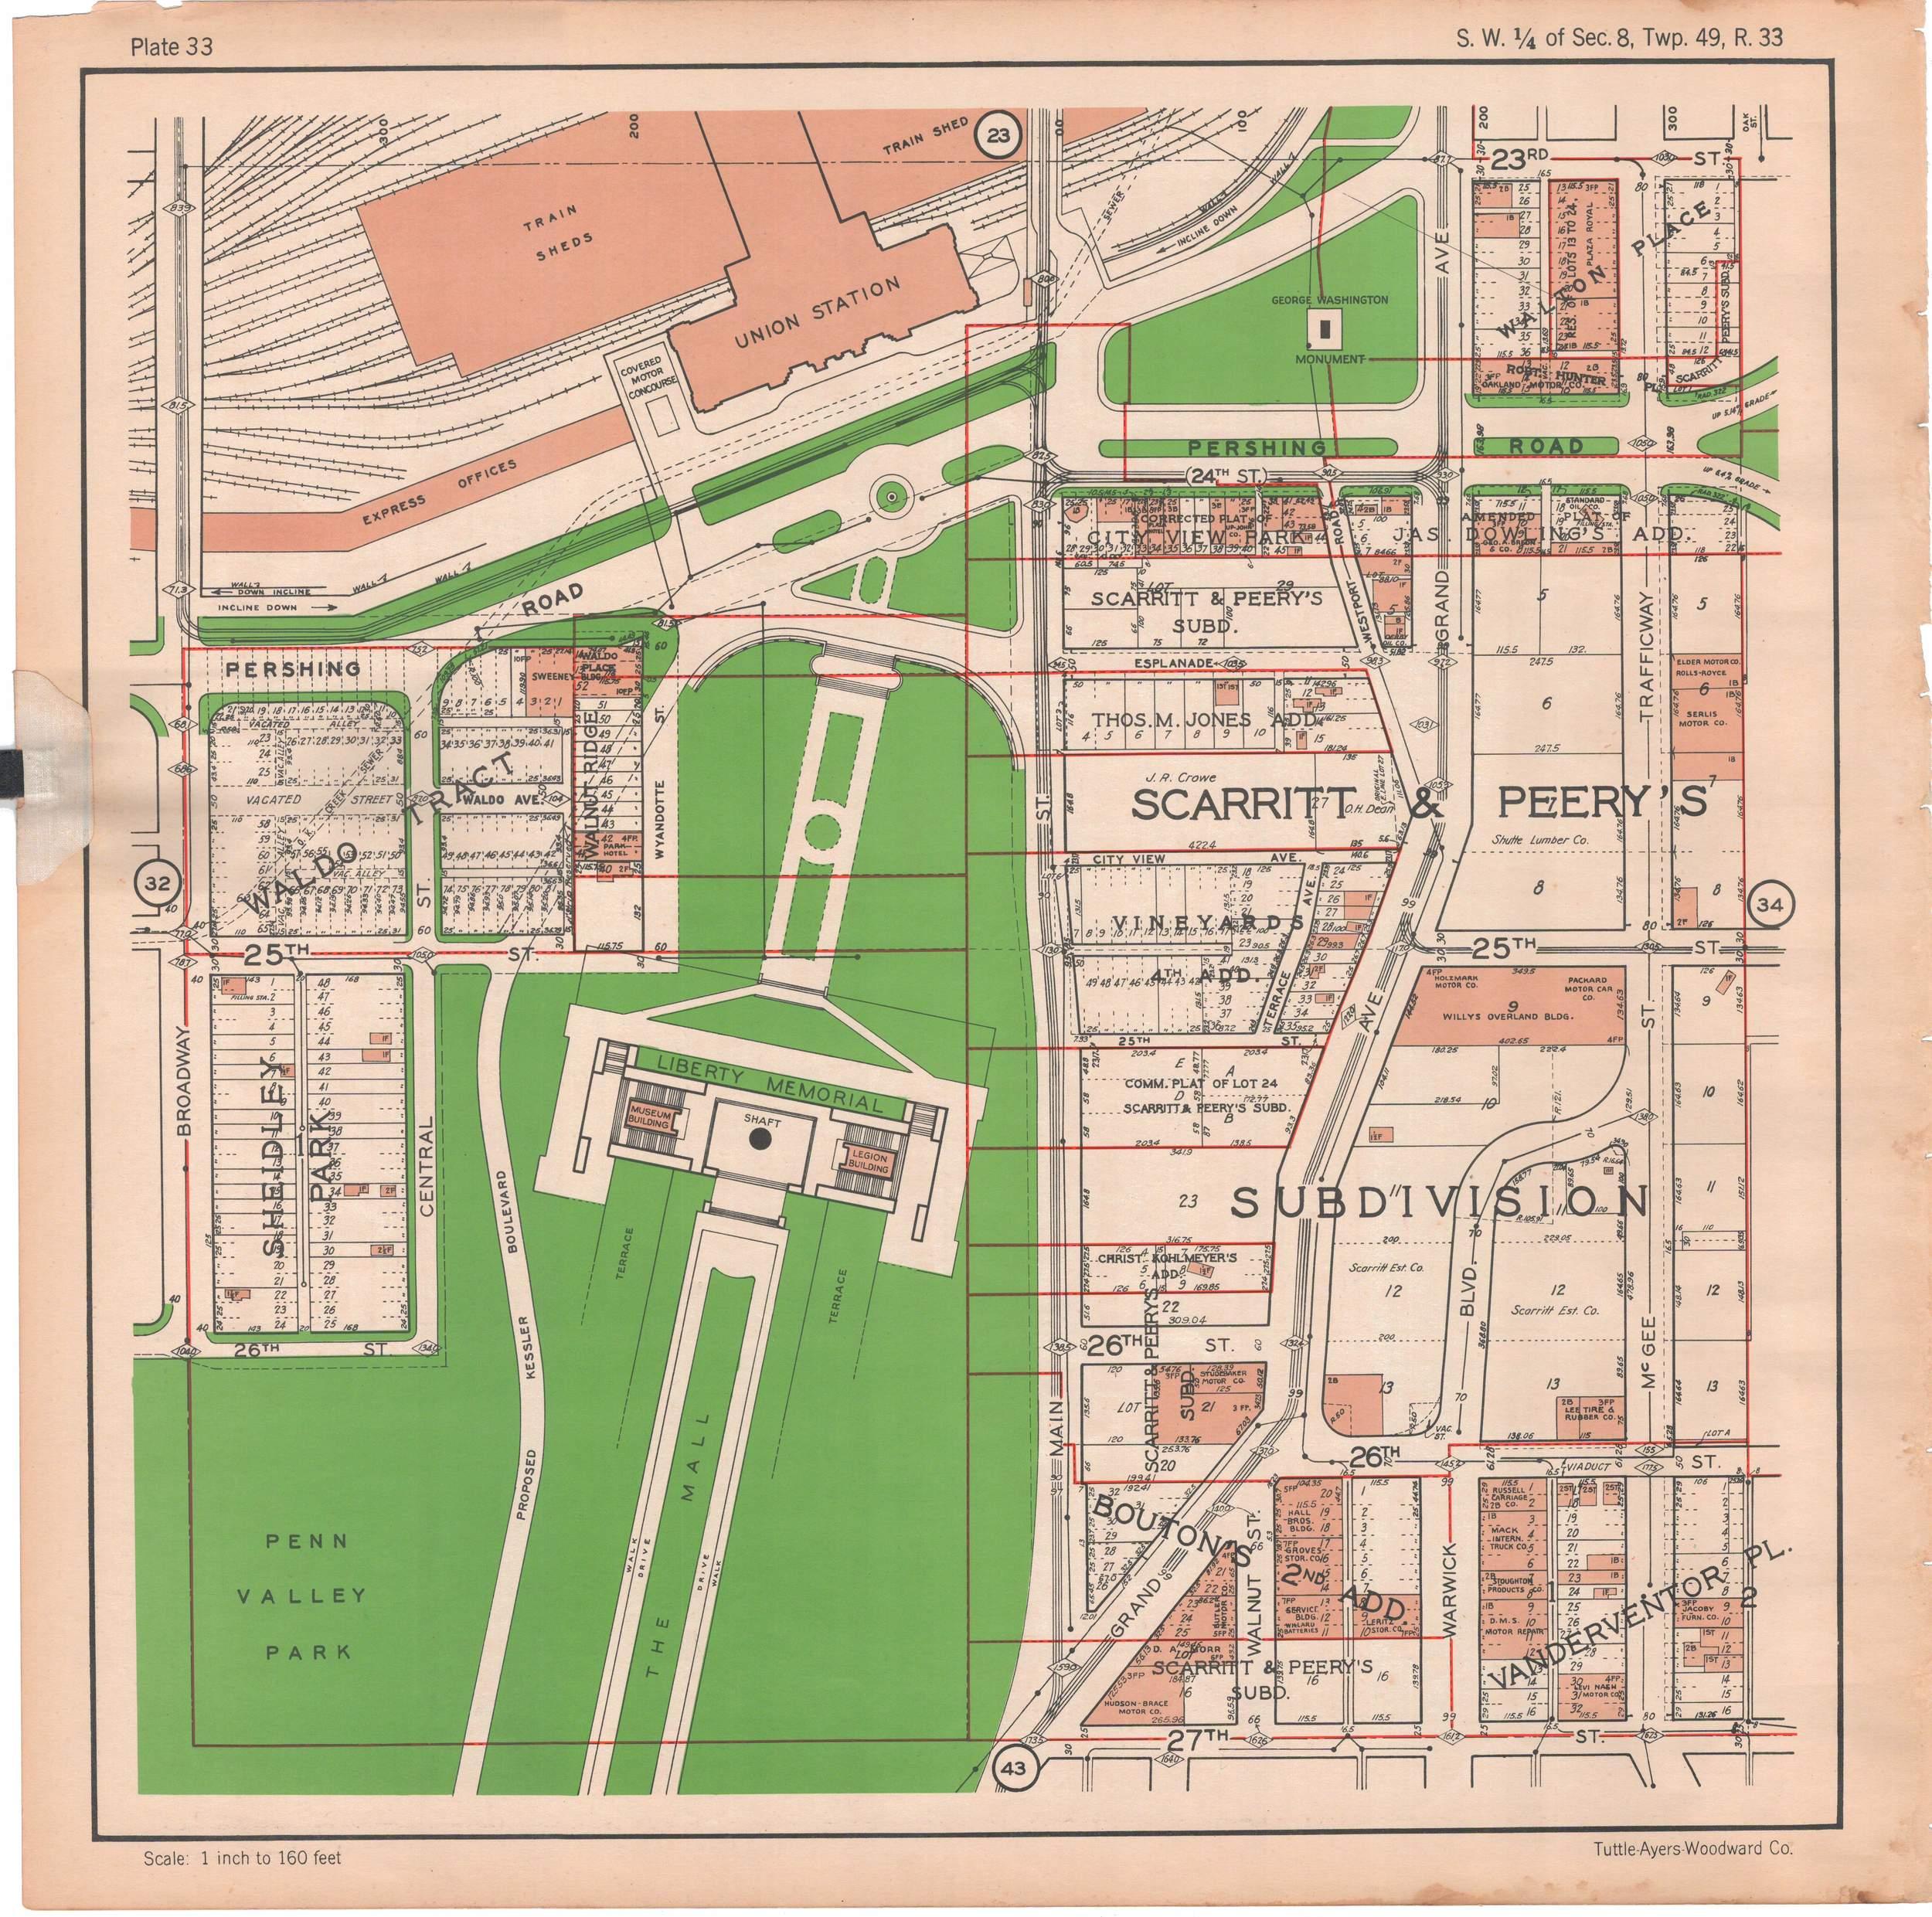 1925 TUTTLE_AYERS_Plate 33.JPG